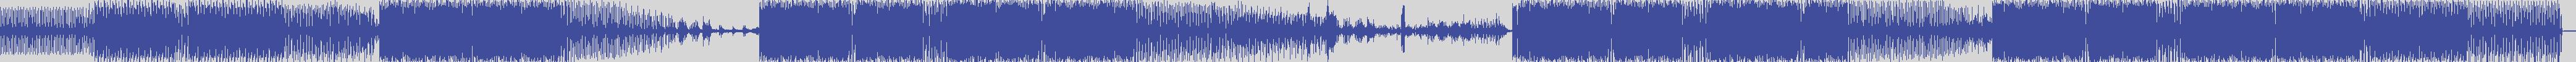 bunny_clan [BYC028] Bass Funk - Play [Original Mix] audio wave form